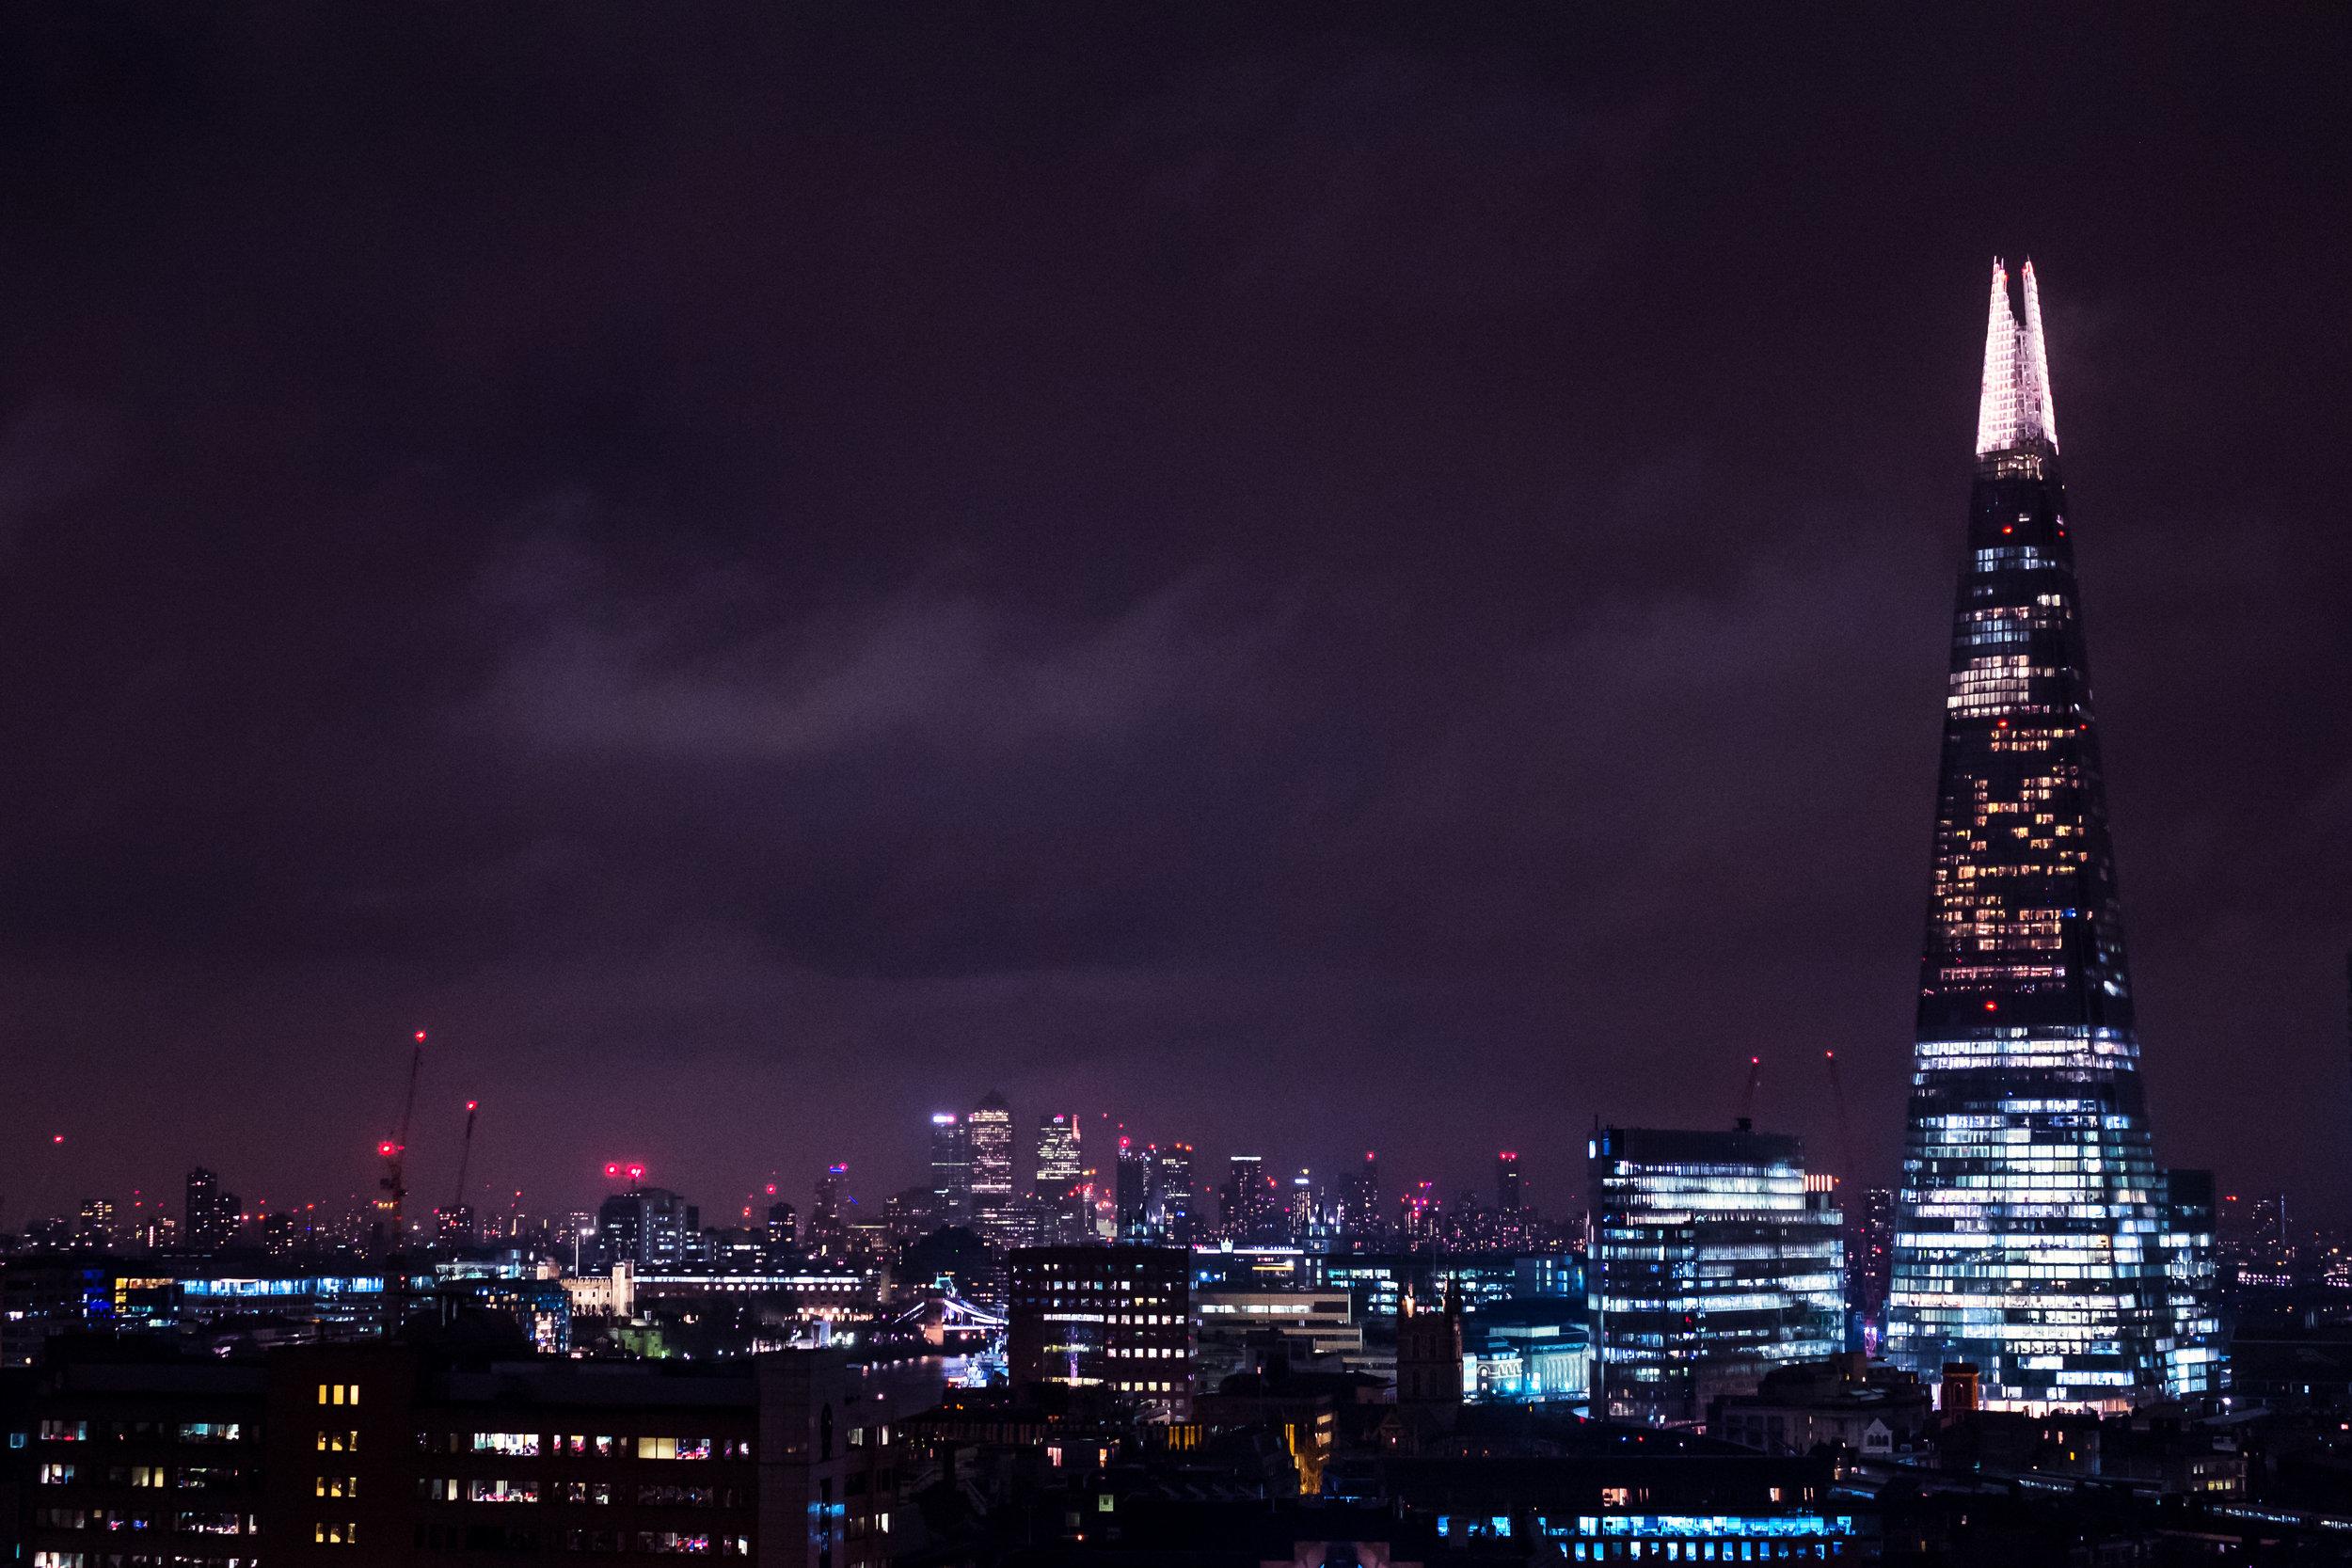 London. January, 2017